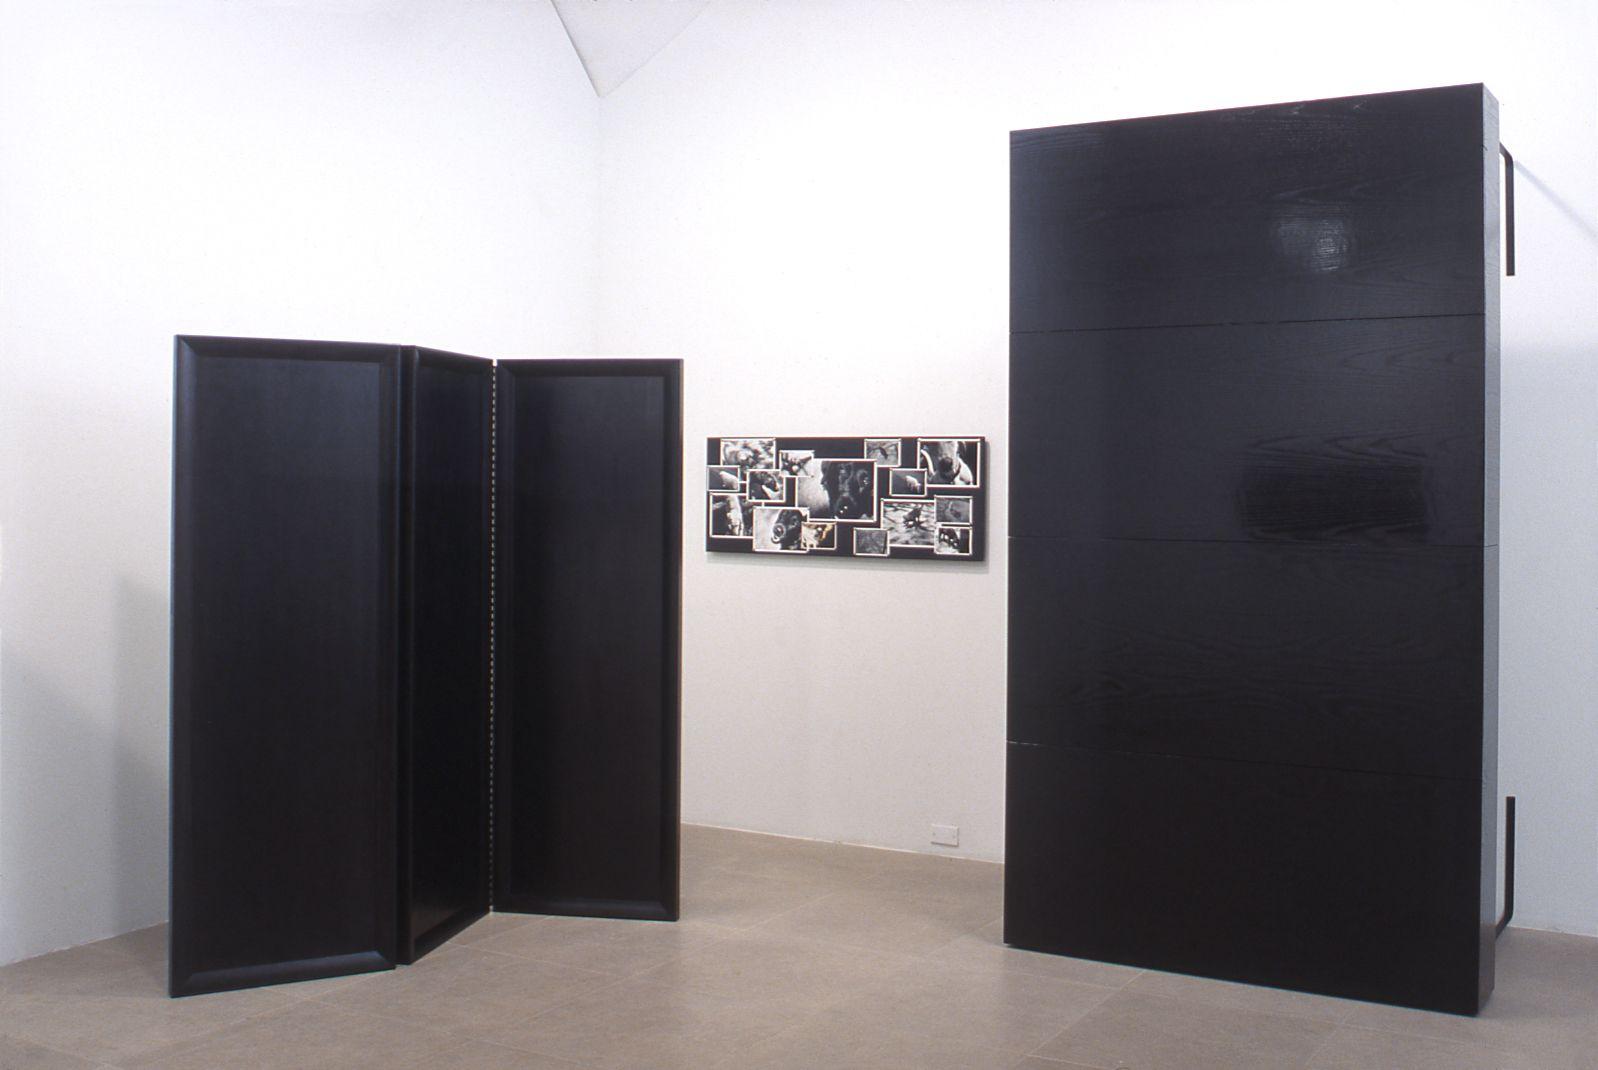 Installation view, Dog Days, Greene Naftali, New York, 2002